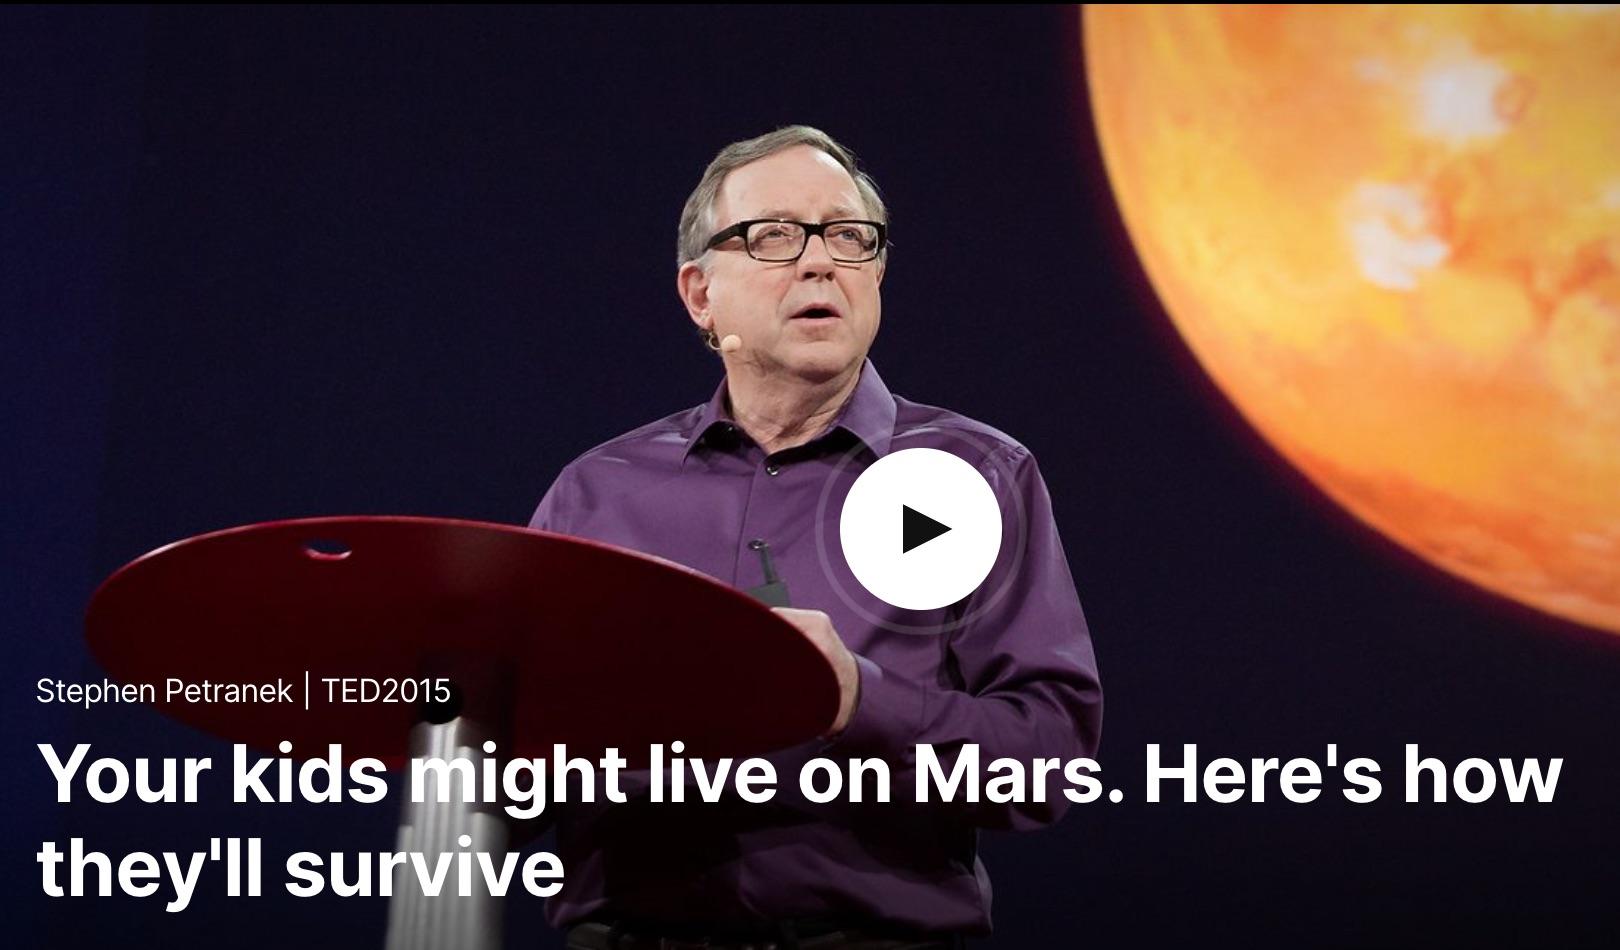 Your Kids on Mars